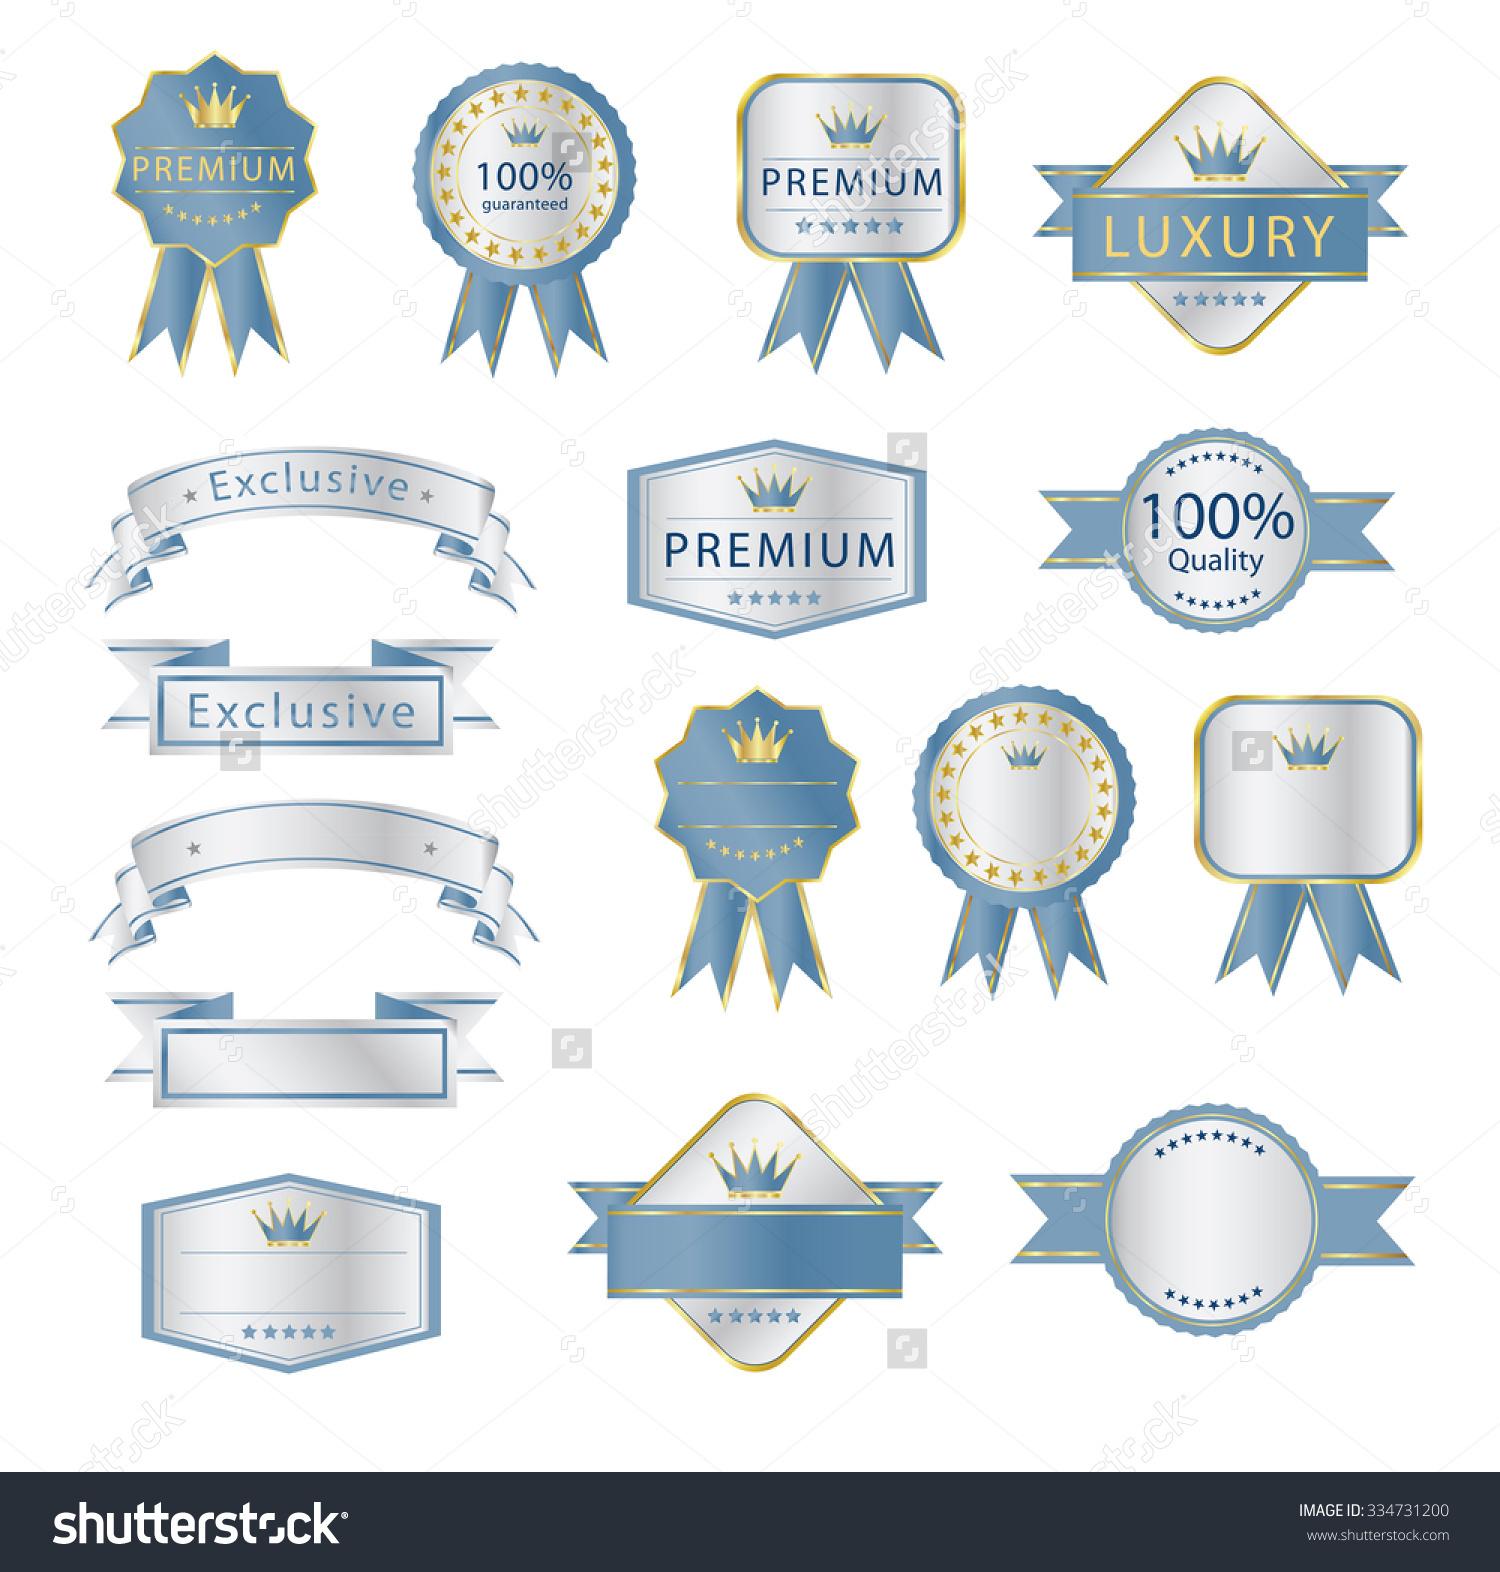 Blank Premium Label Budges Luxury Soft Stock Vector 334731200.